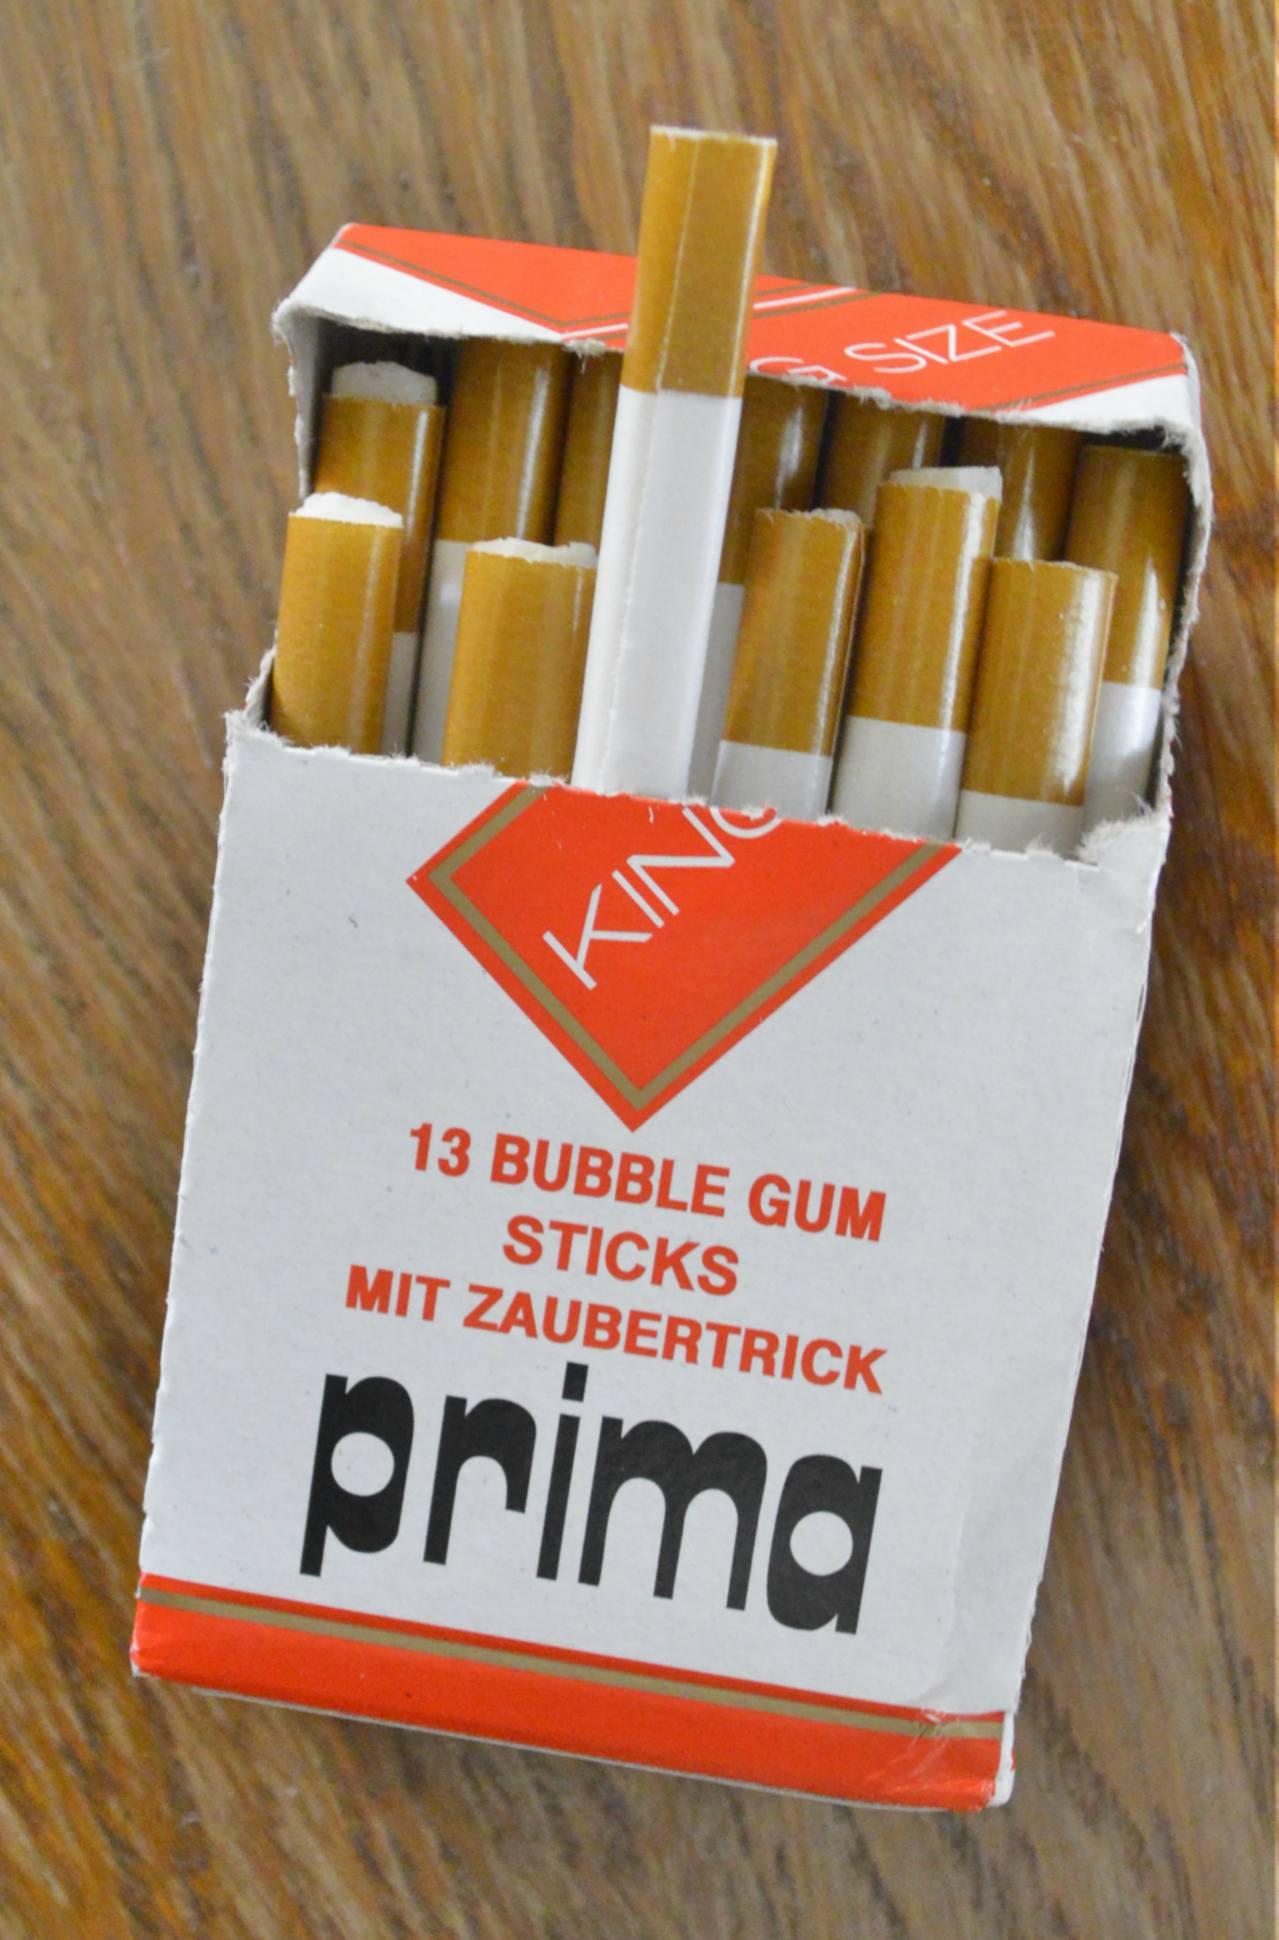 Kaugummi Zigaretten fuer Kinder